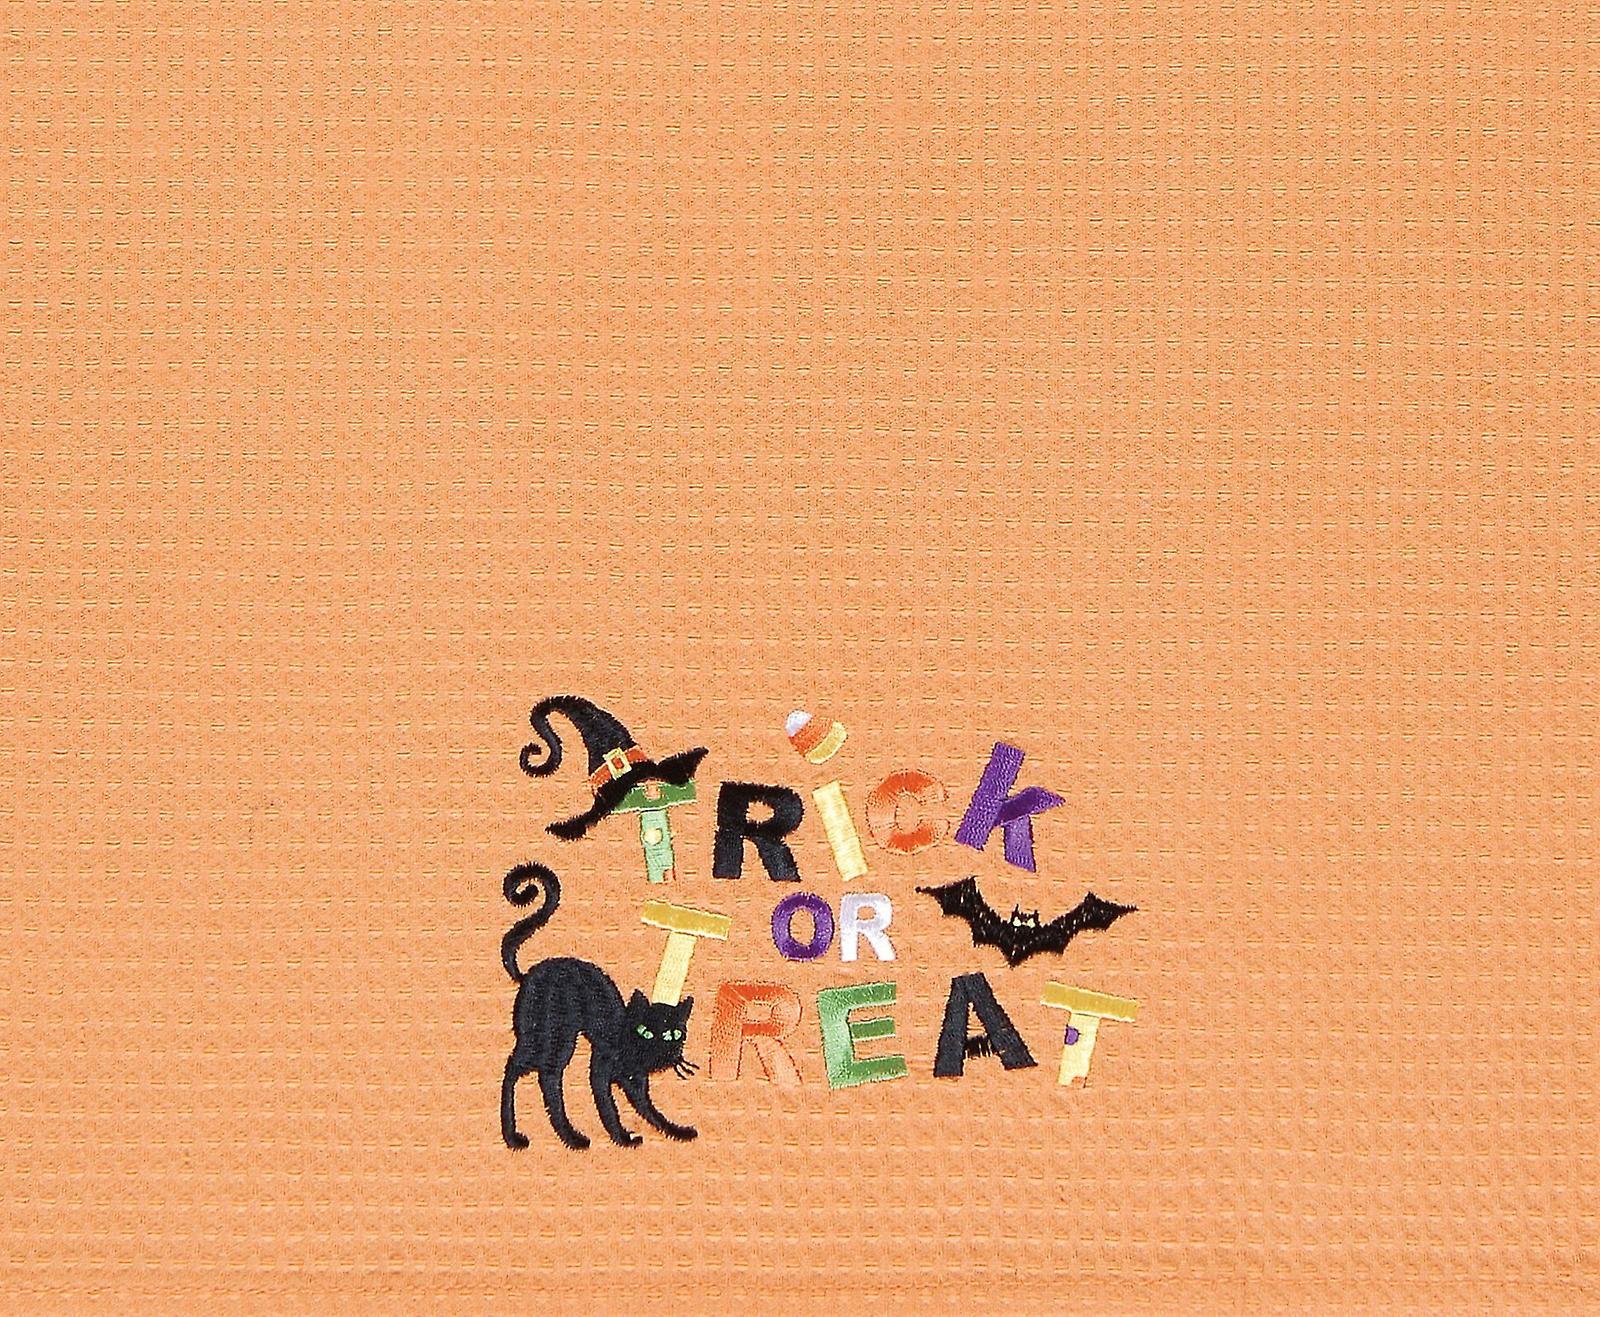 Trick or Treat Halloween Witch Hat Candy Corn Black Cat Bat Cotton Kitchen Towel